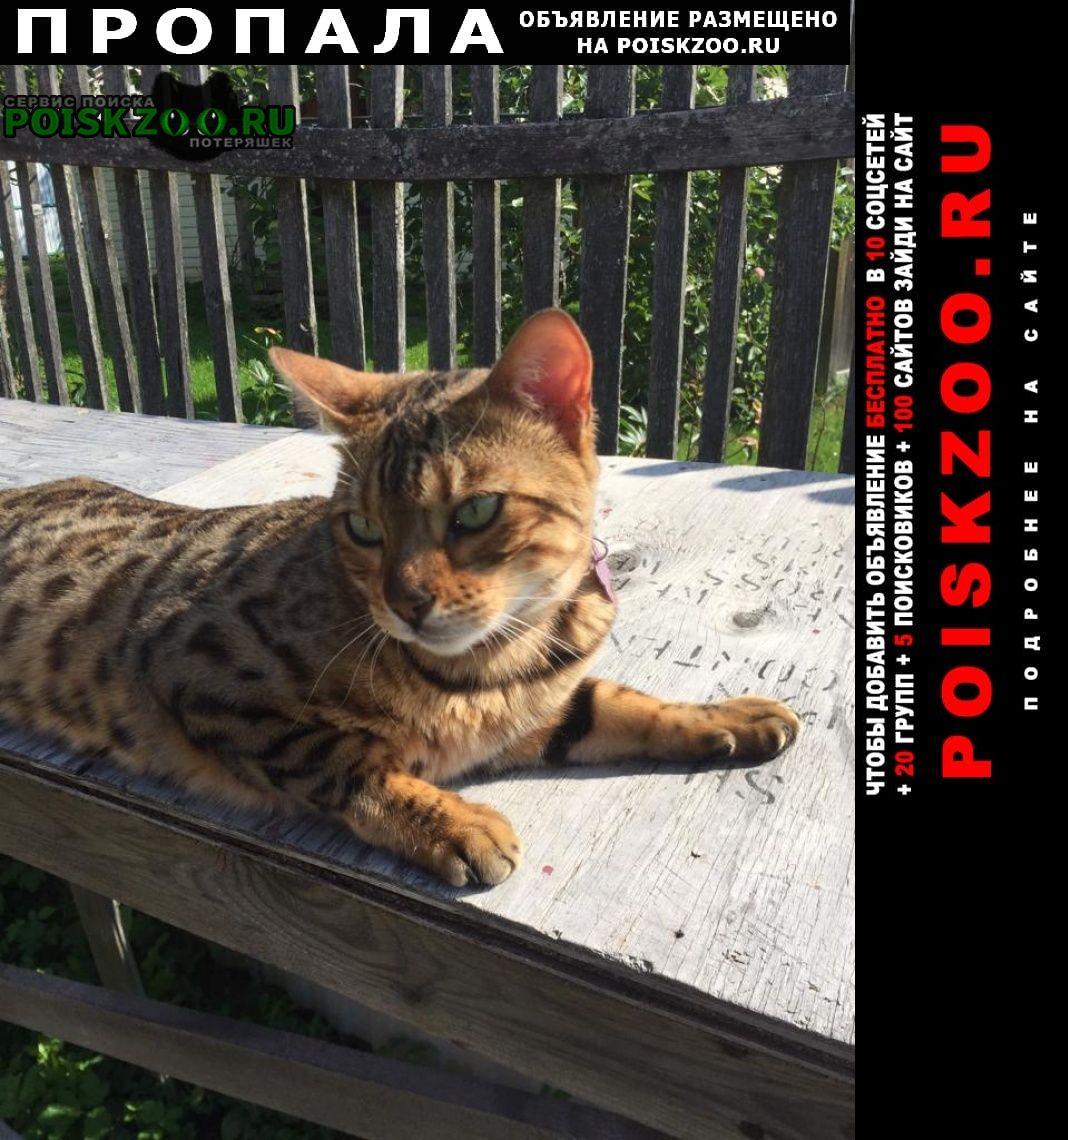 Пропала кошка Дмитров